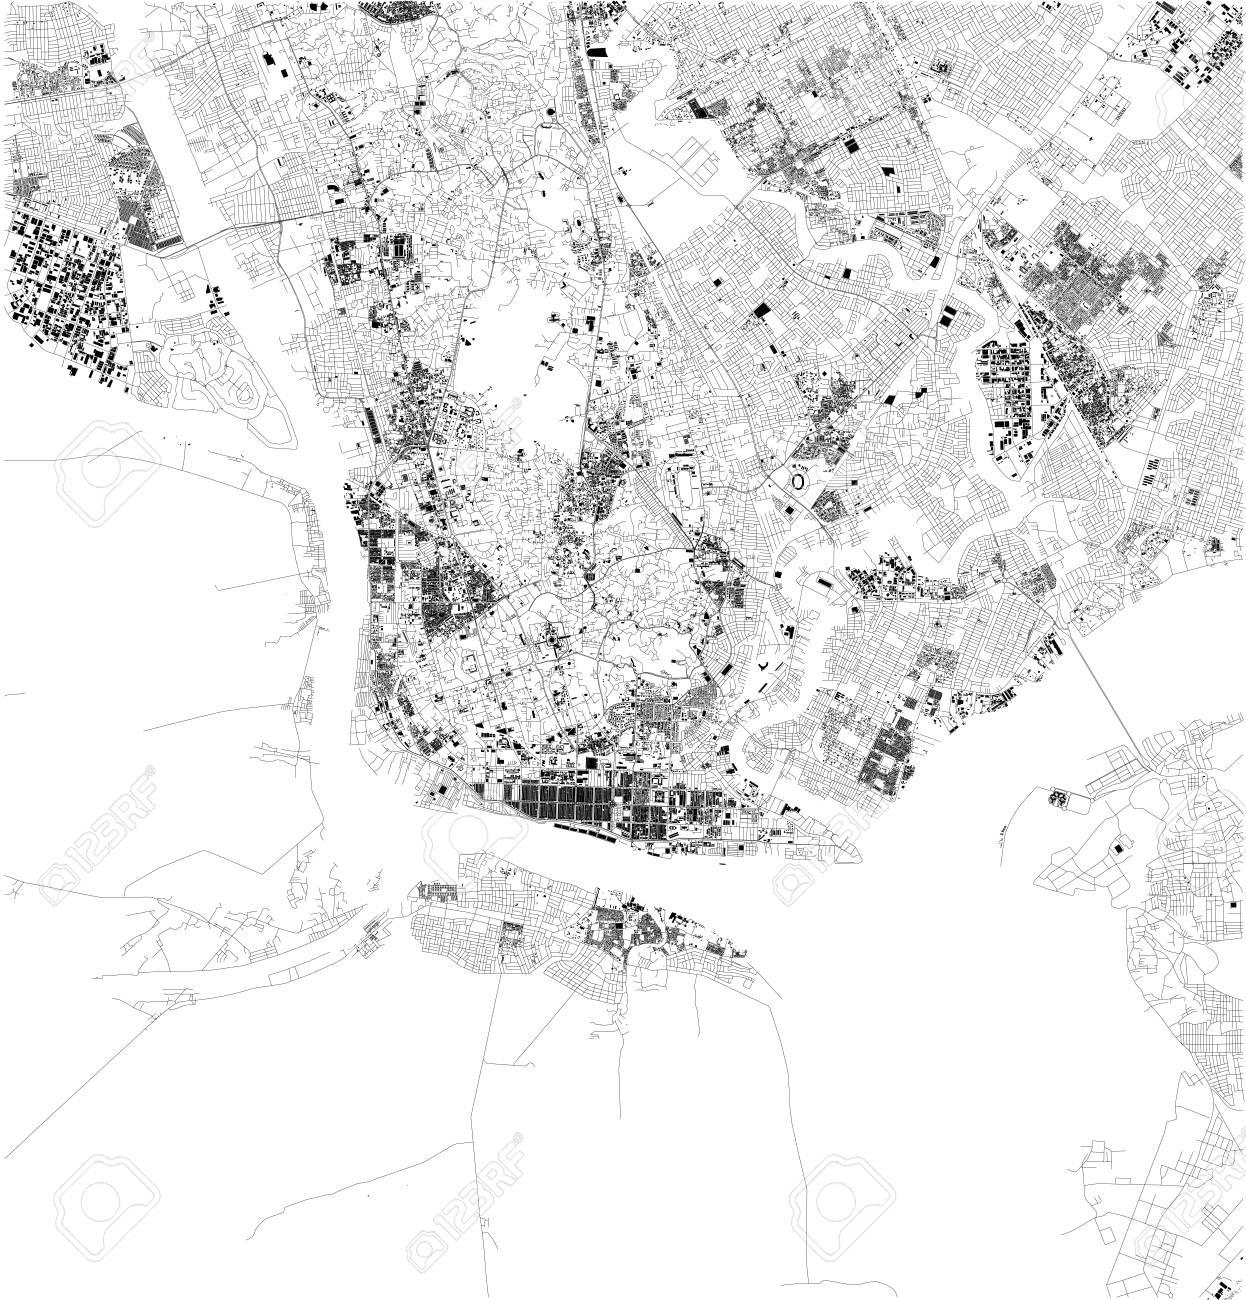 Satellite map of Yangon, Myanmar ,, city streets. Street map,.. on tegucigalpa street map, richards bay street map, riga street map, kampala street map, nagoya street map, myammar taunggyi city map, george town street map, colombo street map, ho chi minh city street map, sarajevo street map, rotterdam street map, chiang mai street map, guilin street map, qatar street map, benghazi street map, amman street map, multan street map, rangoon map, taipei city street map, zagreb street map,